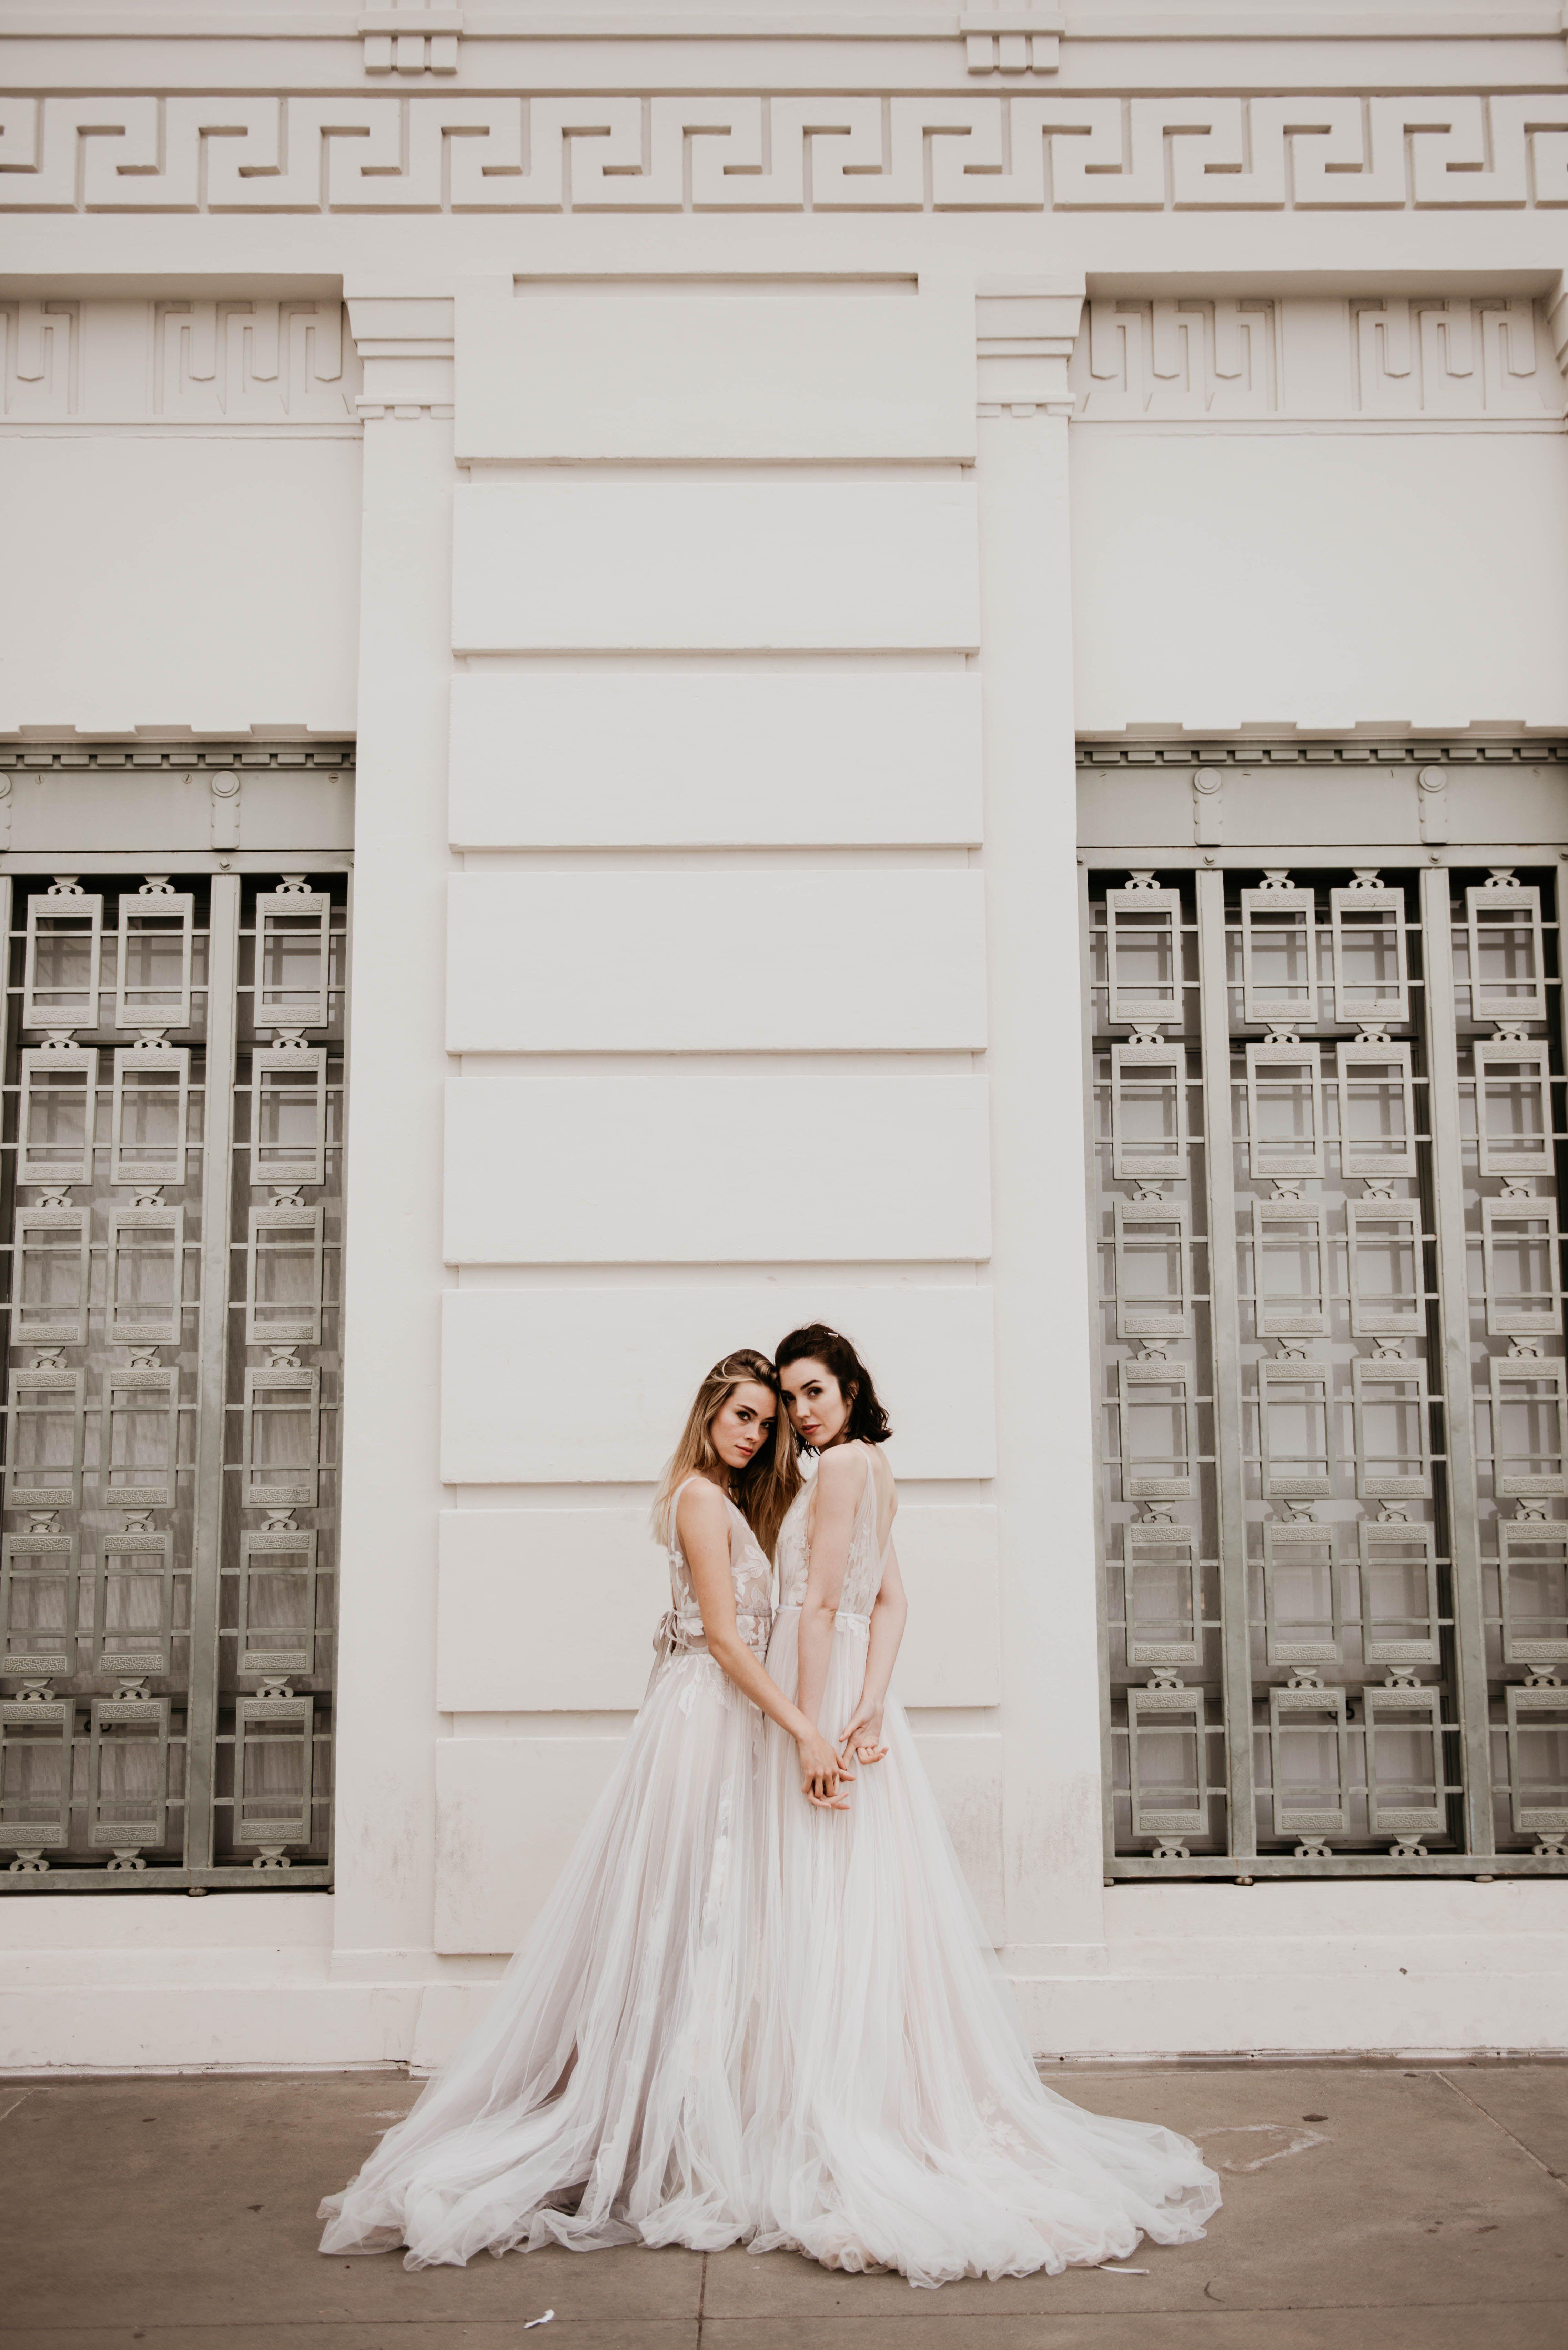 Griffith Observatory Elopement Lgbtq Wedding Los Angeles Wedding Lgbtq Elopement L Wedding Los Angeles Lgbtq Wedding Los Angeles California Photography